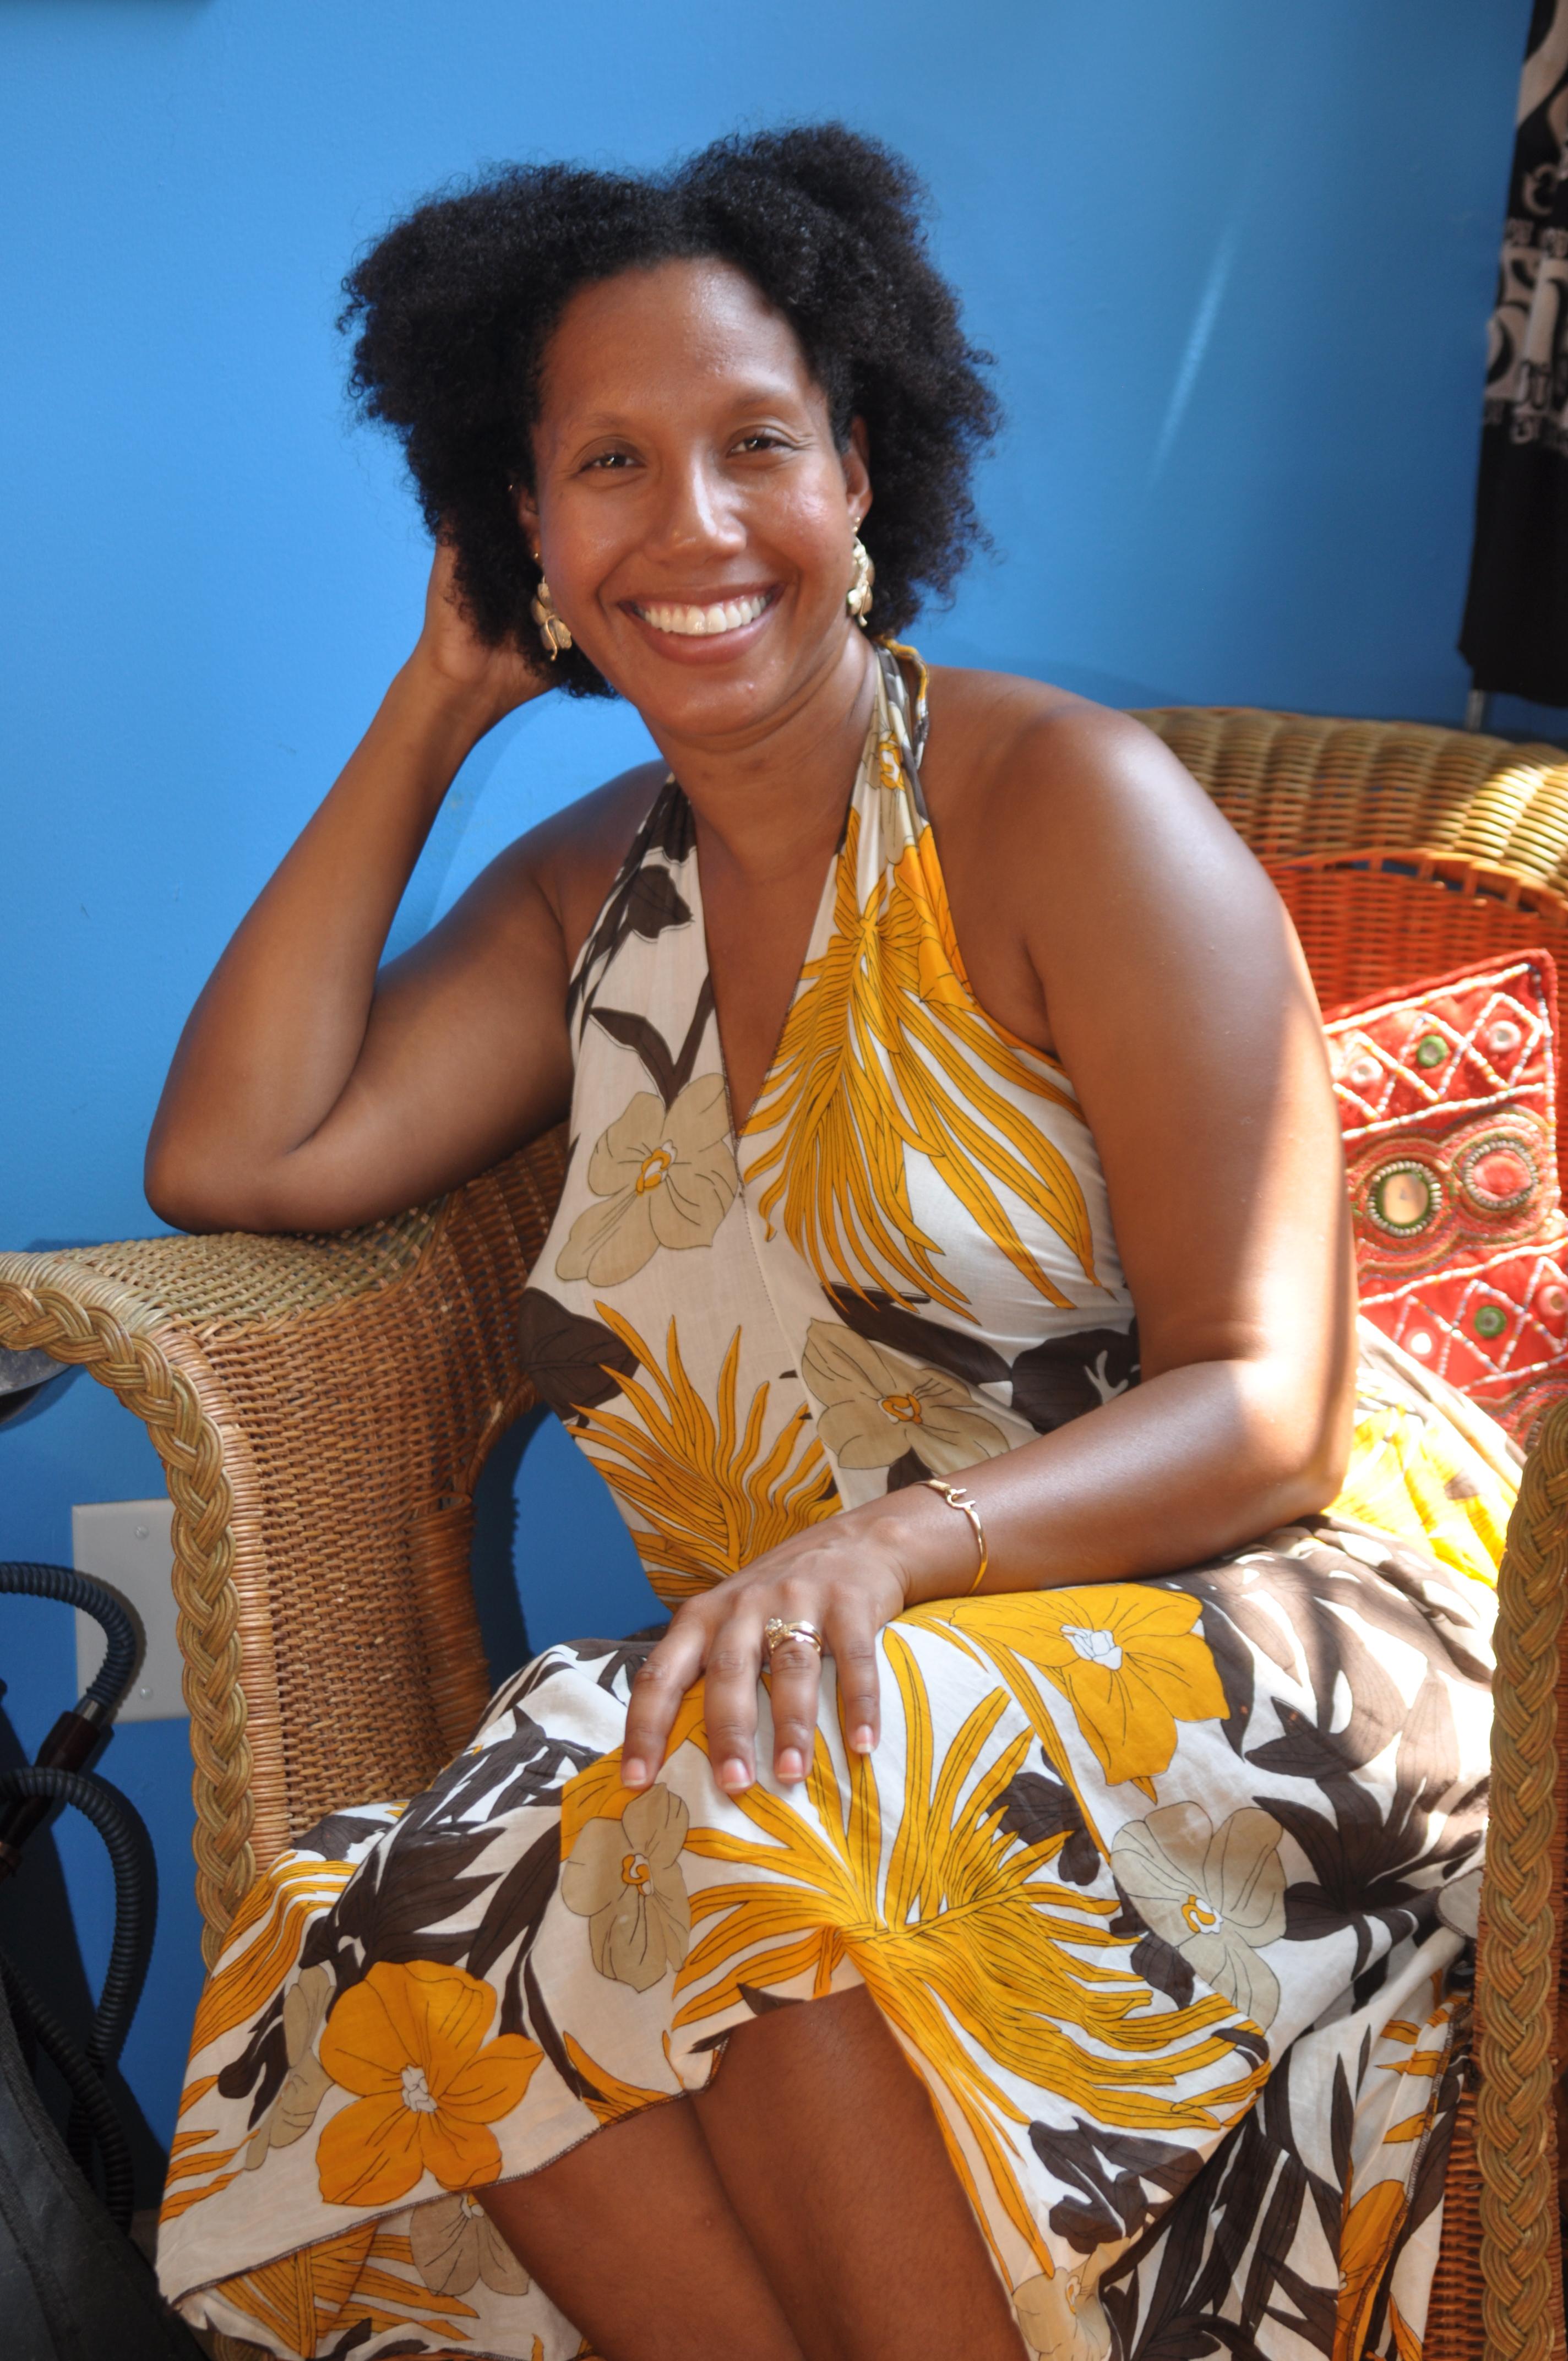 Tiphanie Yanique